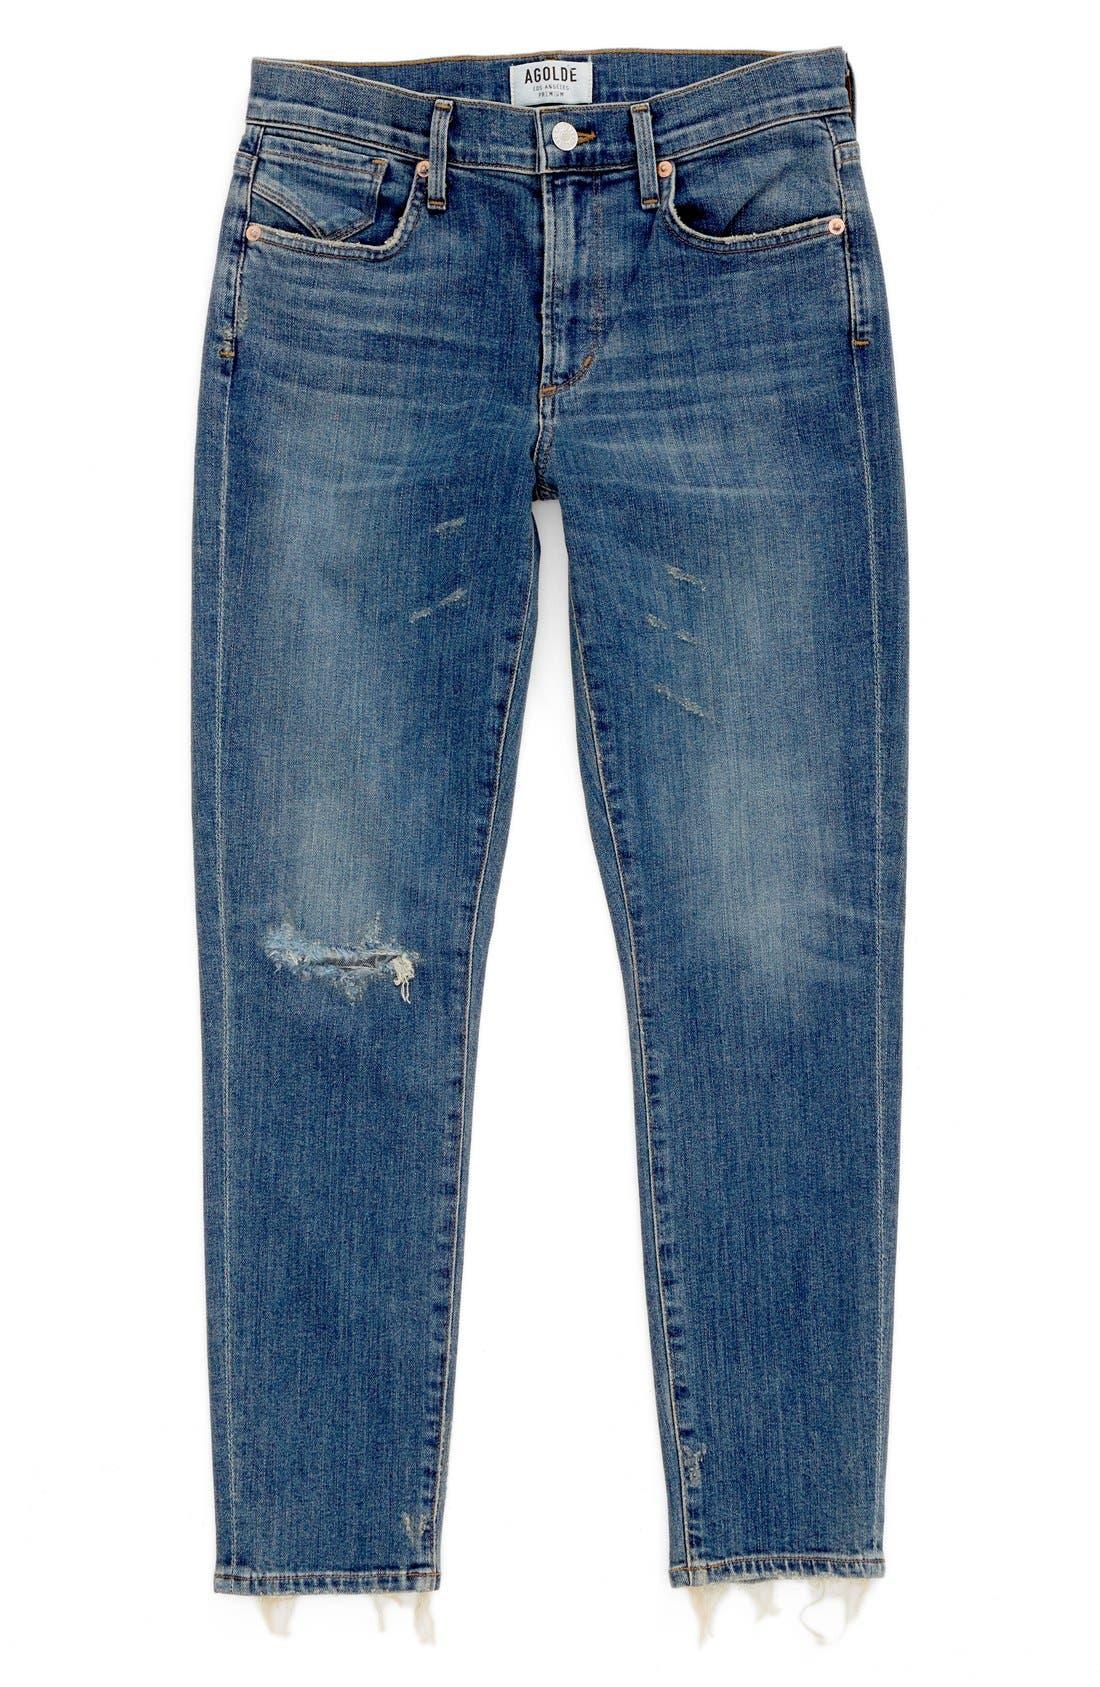 Main Image - AGOLDE Sophie Crop High Rise Skinny Jeans (Santa Fe) (Women)